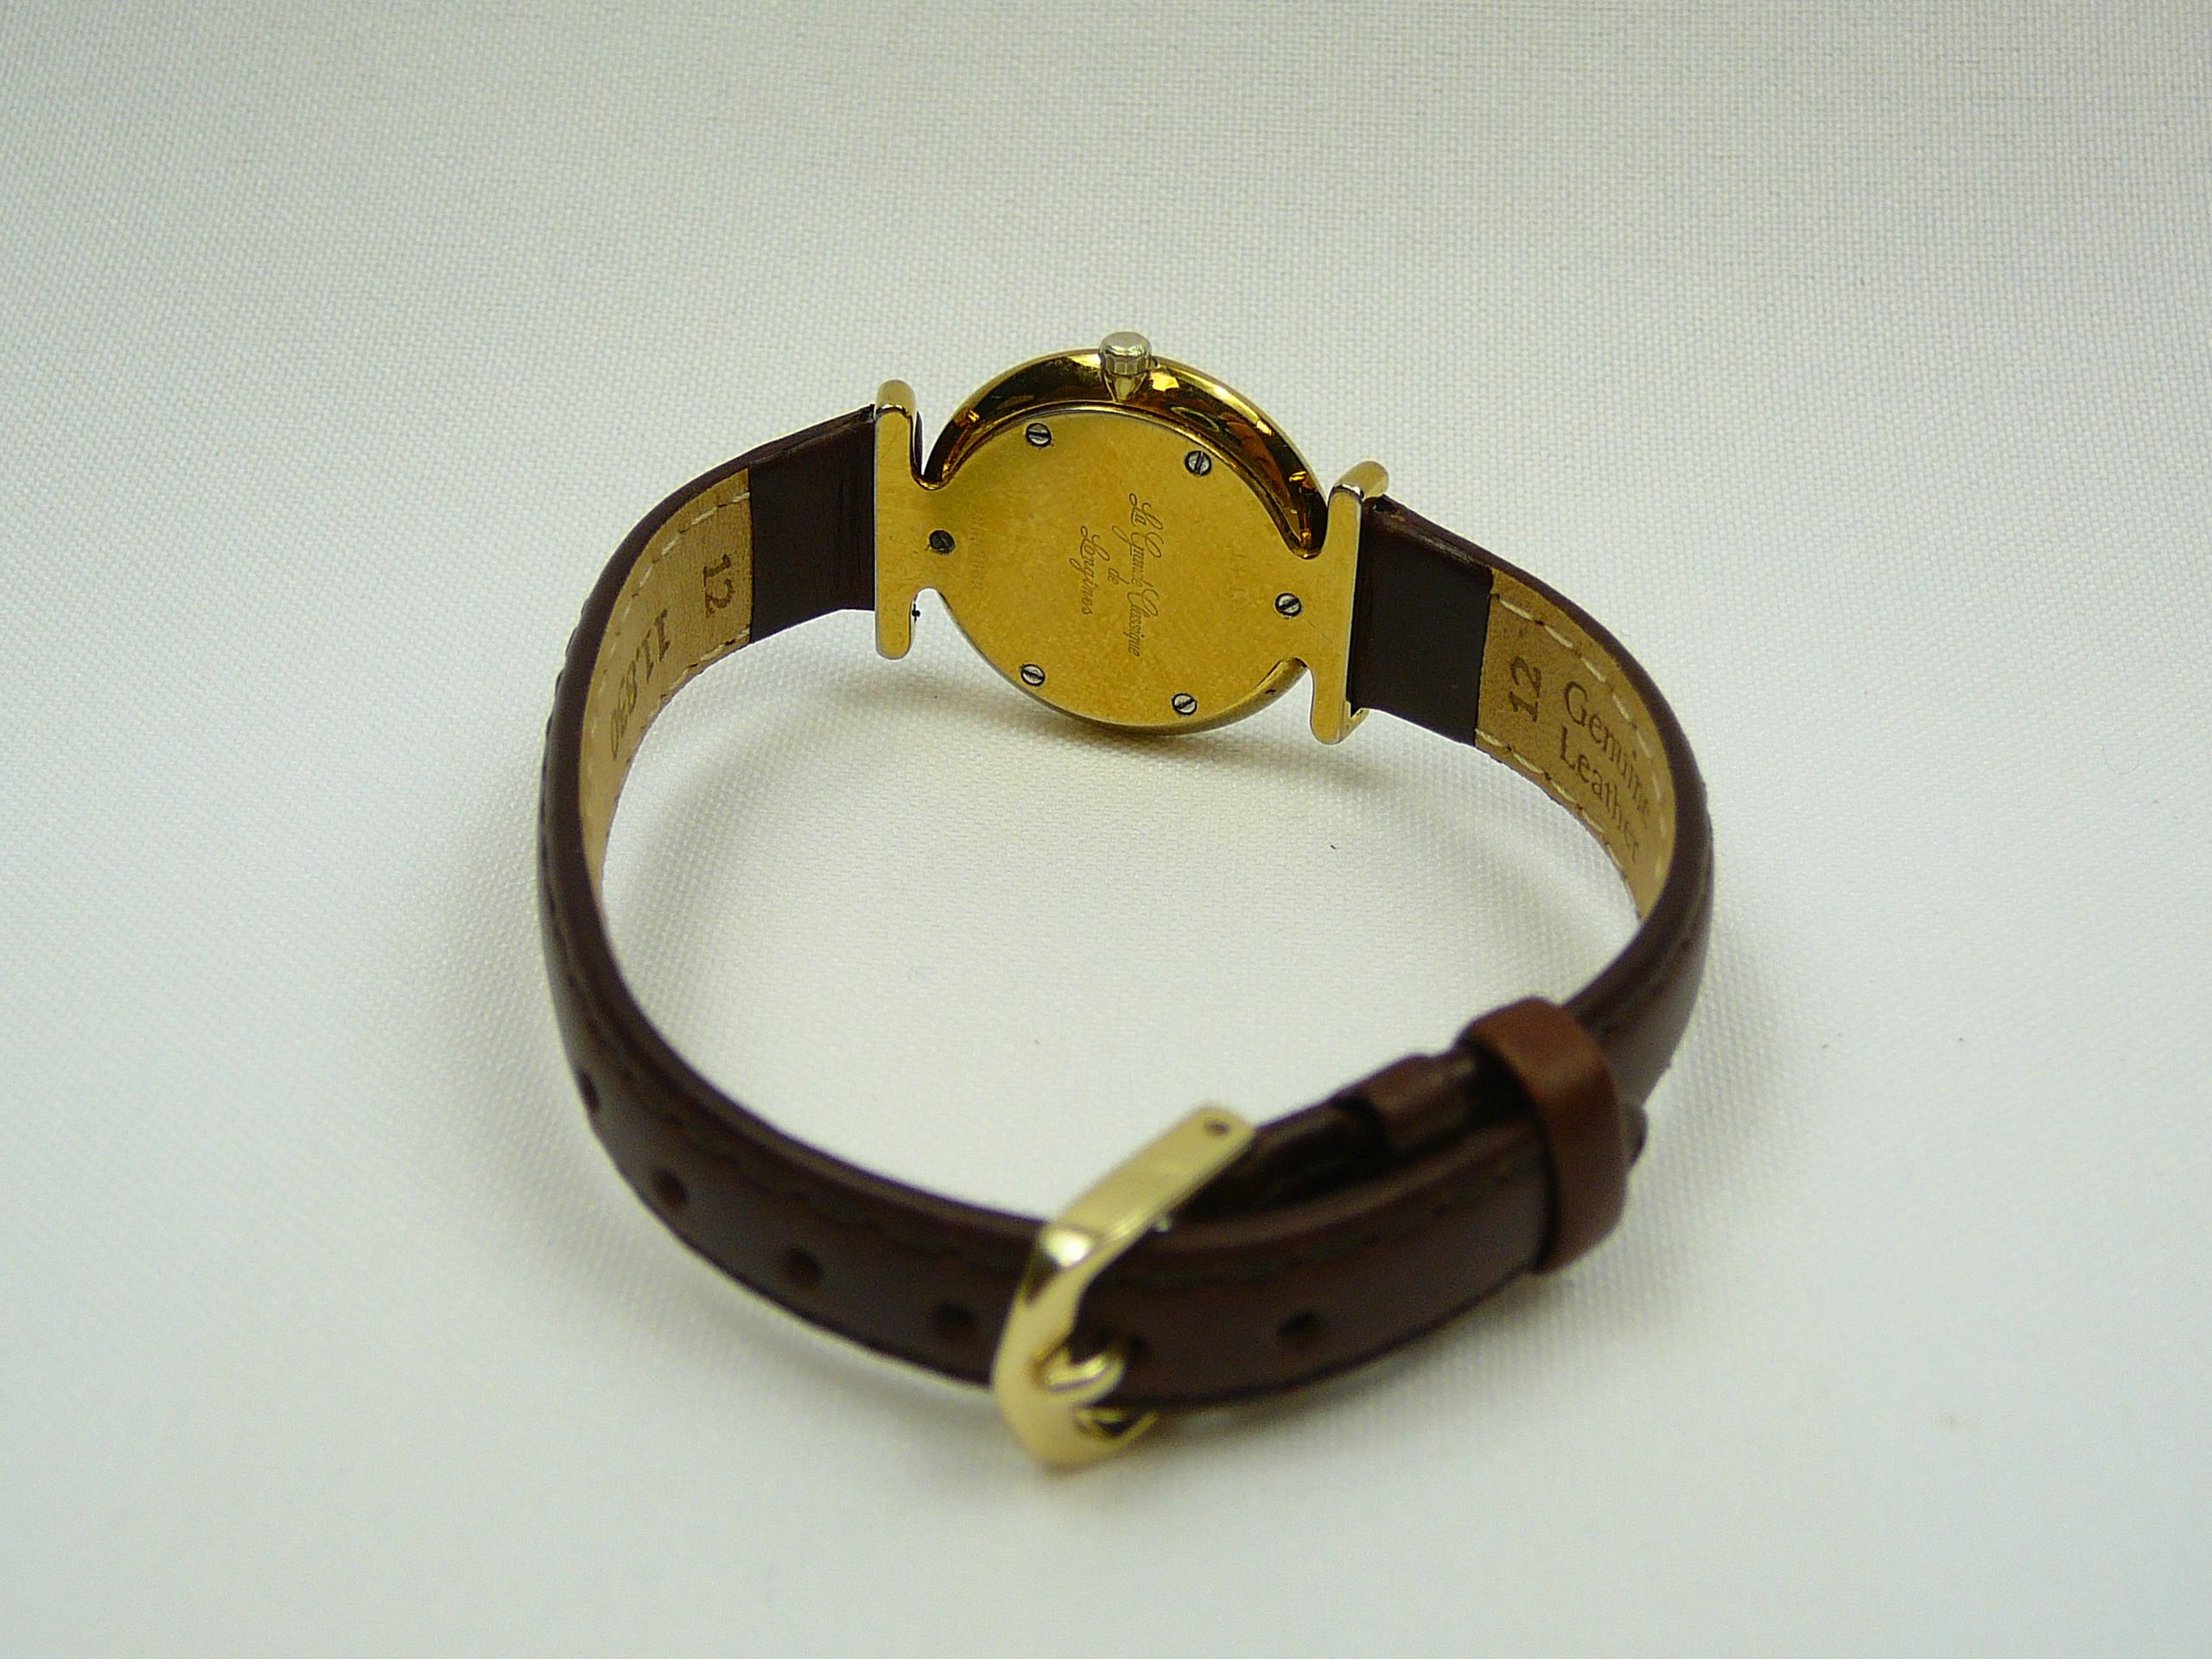 Ladies Longines Wrist Watch - Image 3 of 3